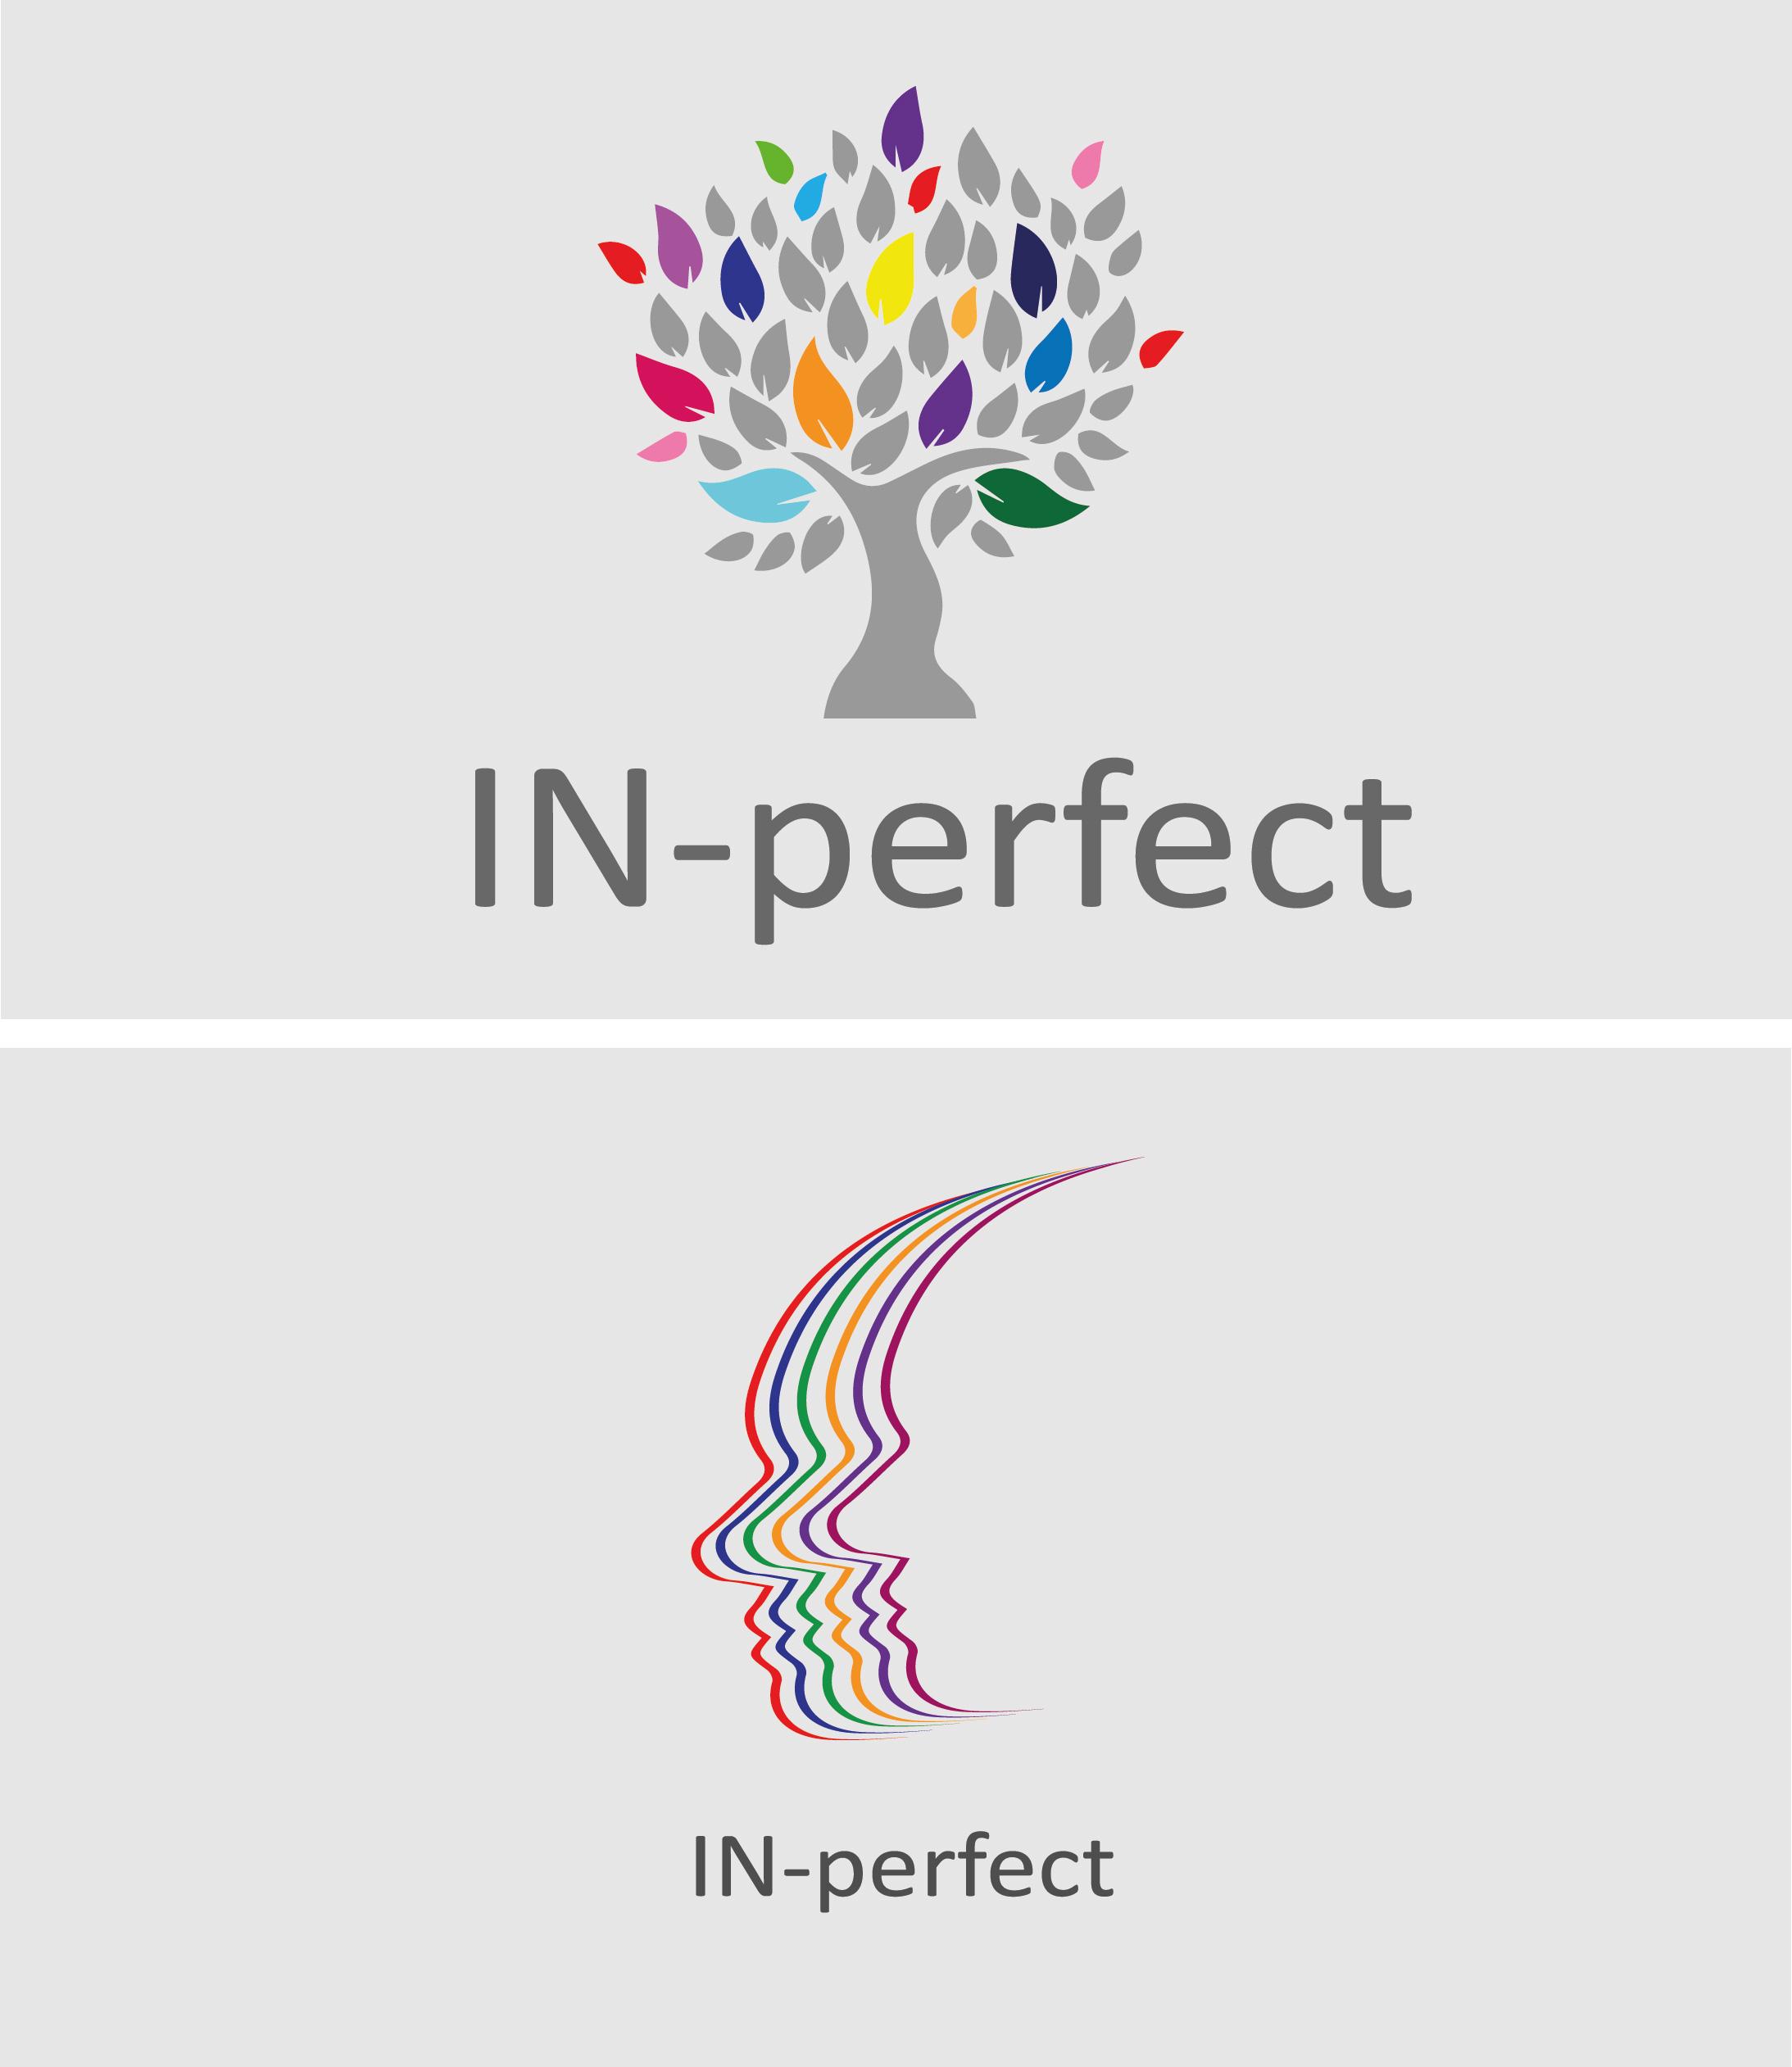 Необходимо доработать логотип In-perfect фото f_0475f25471fa0c96.jpg